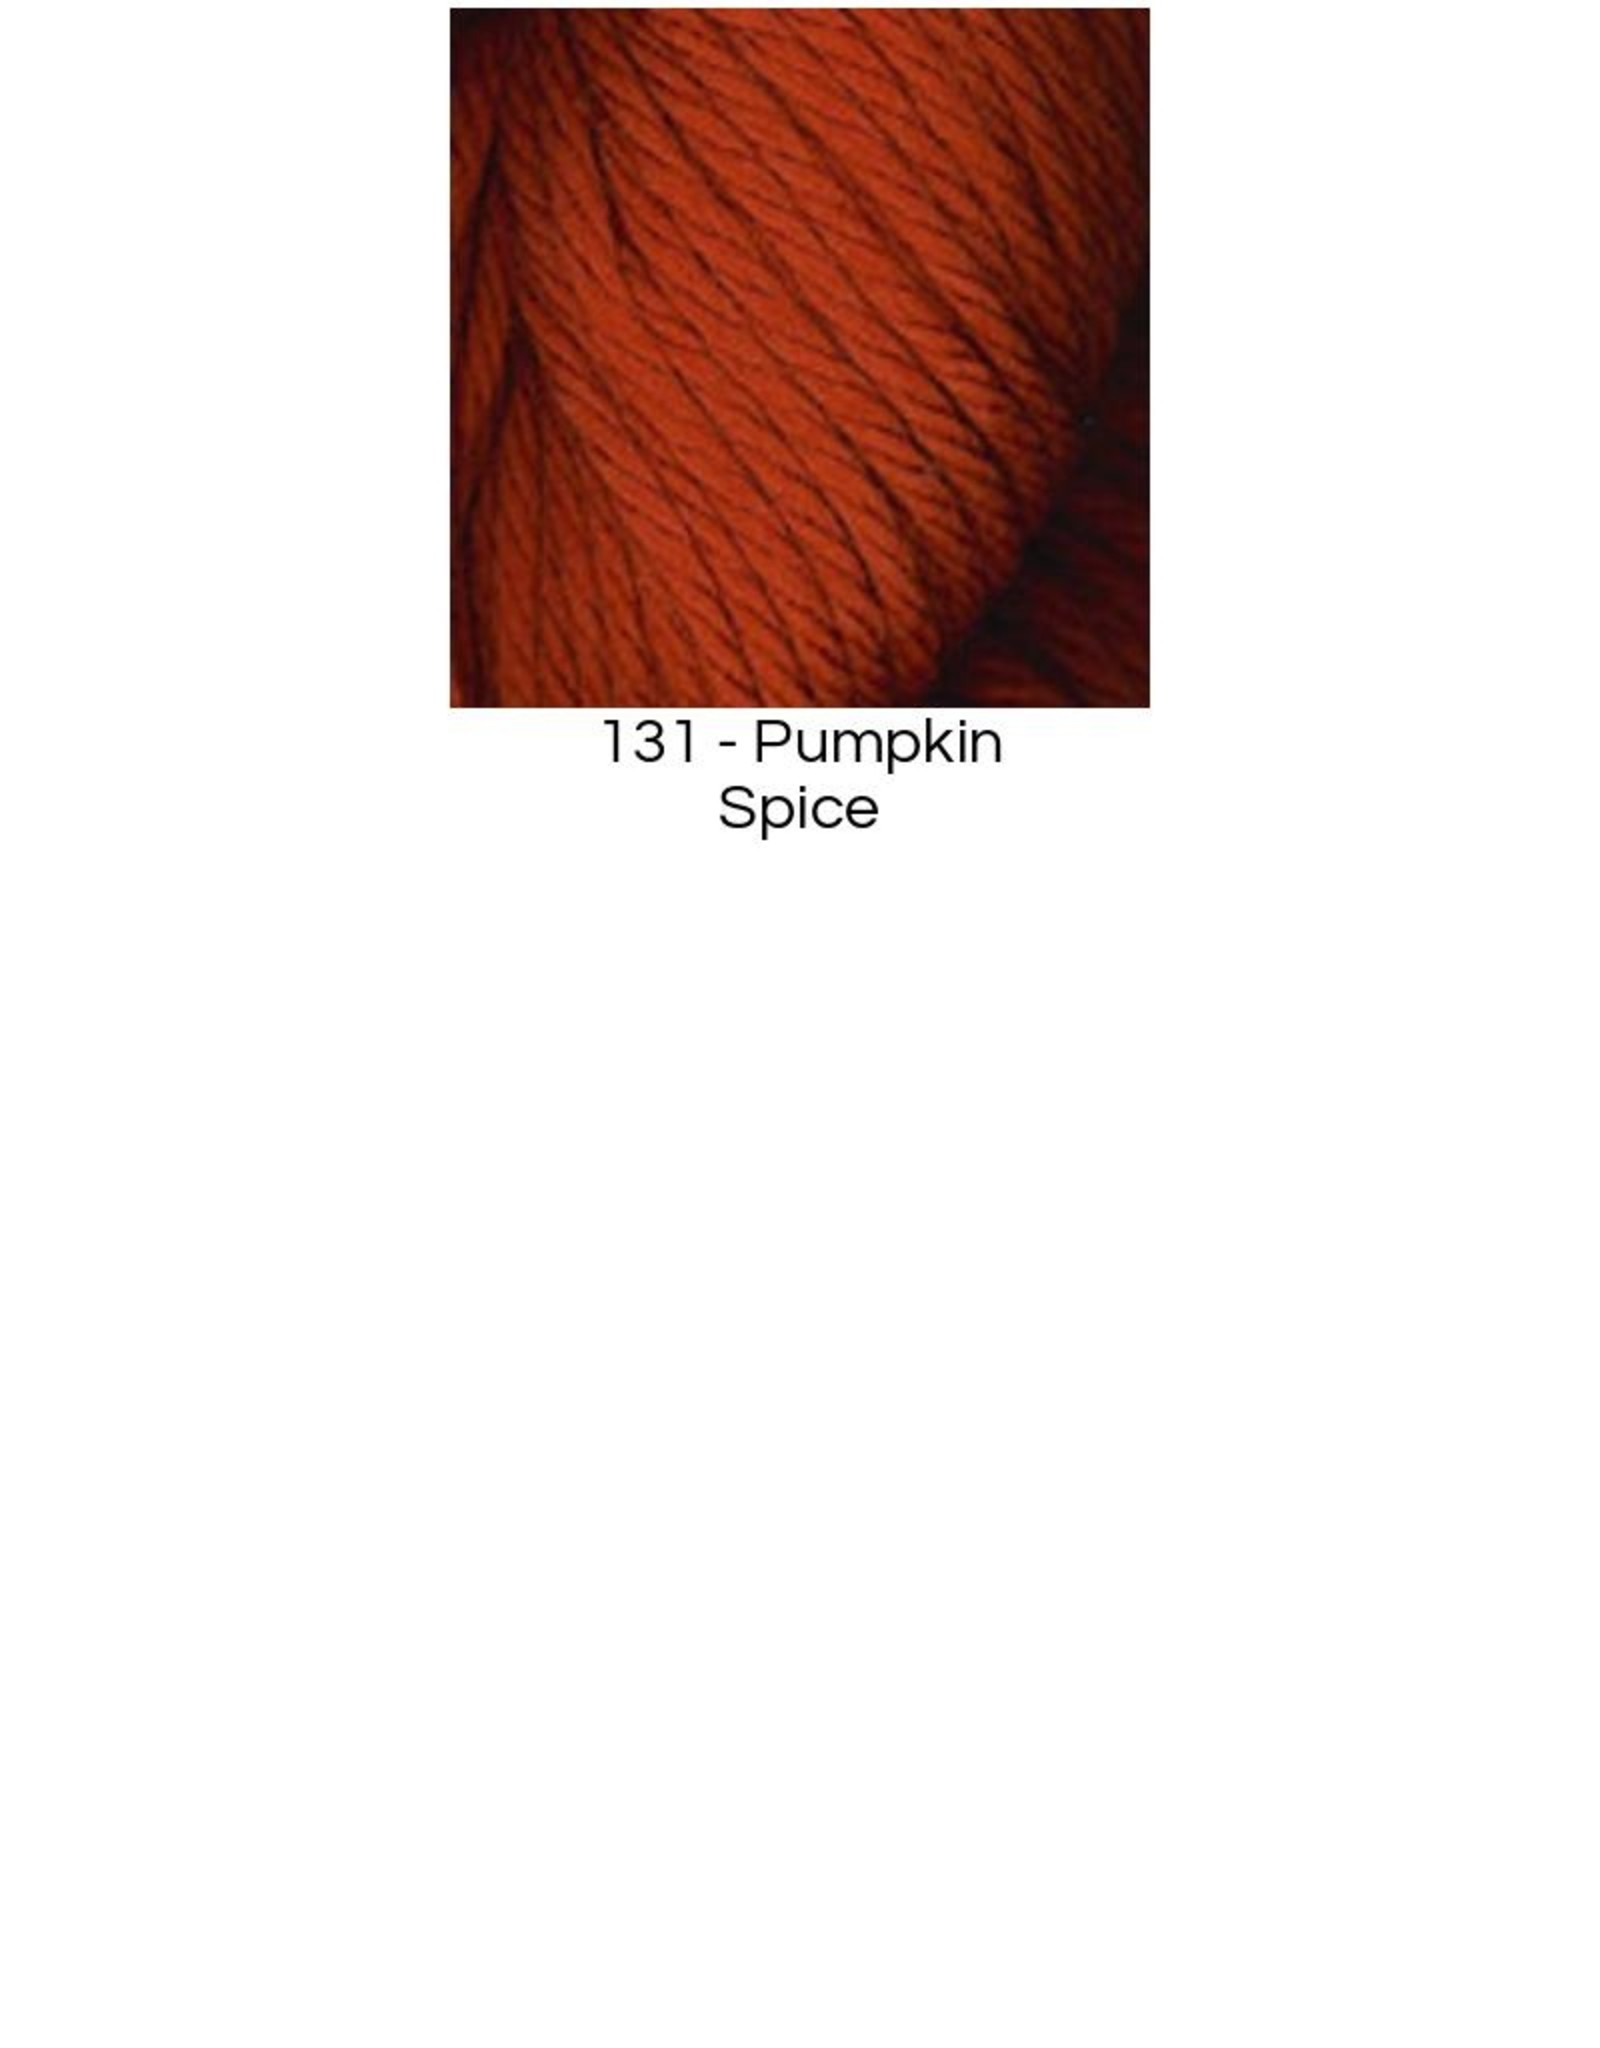 Plymouth Yarn Plymouth Chunky Merino Superwash